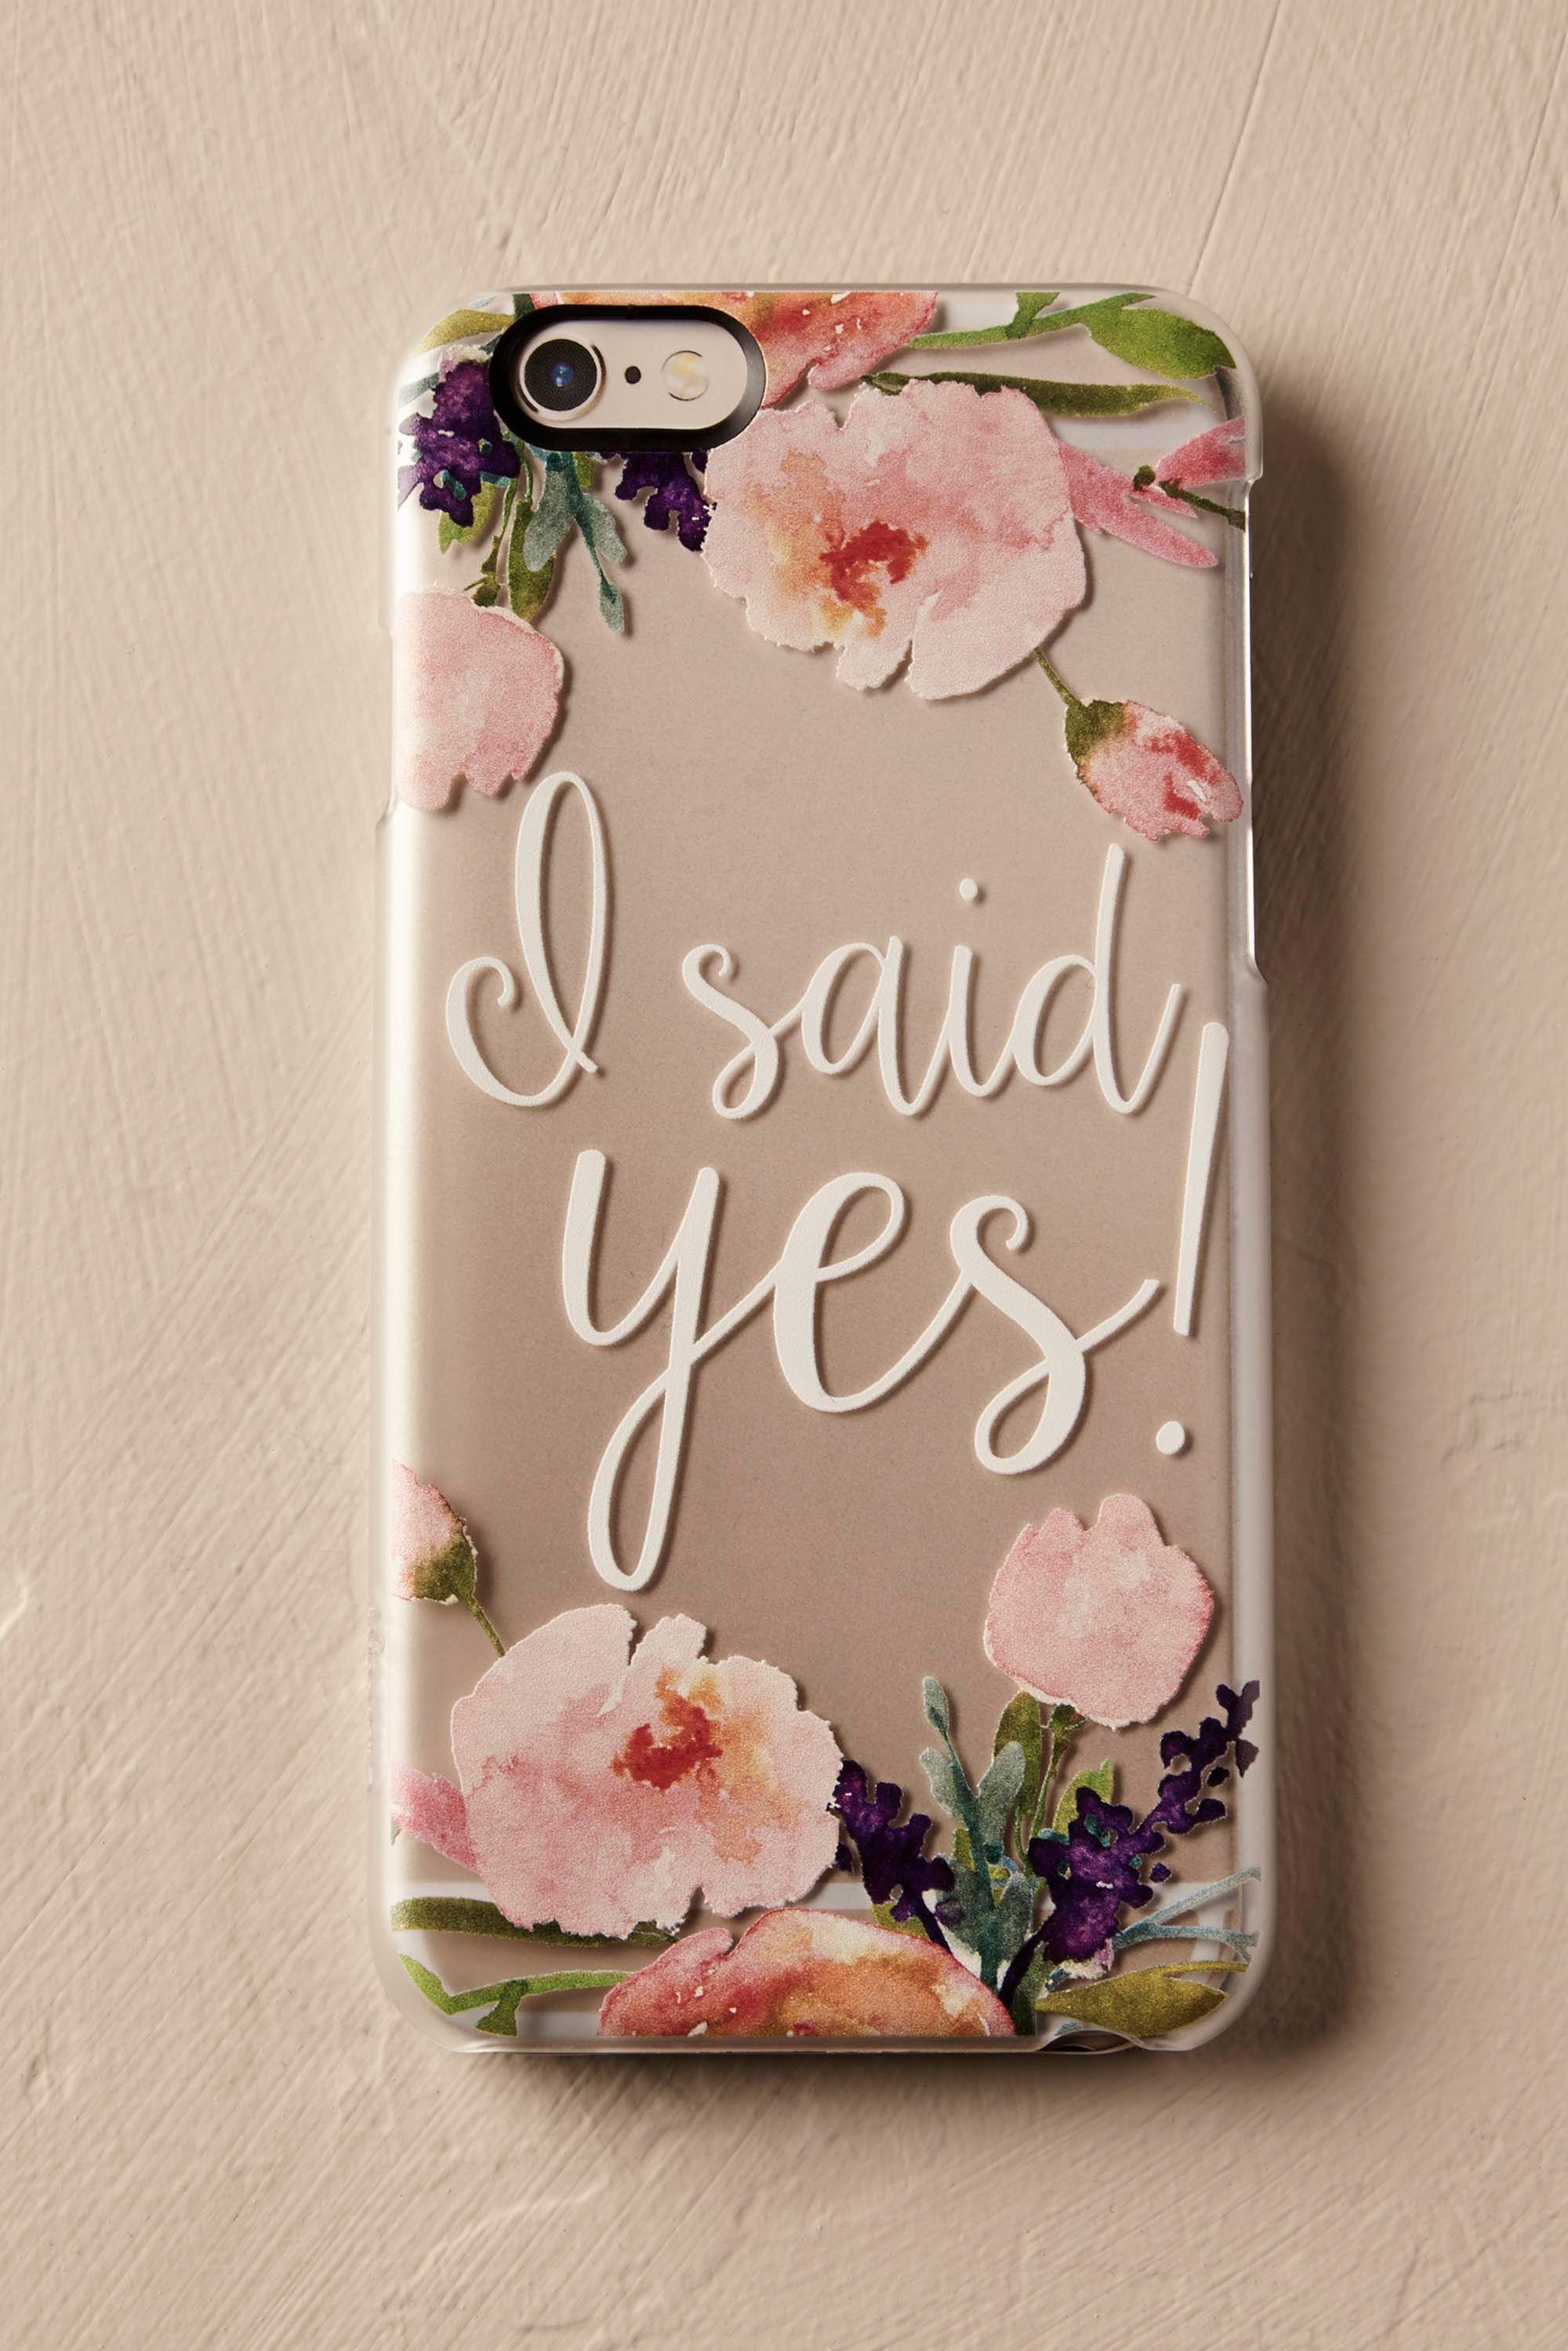 I Said Yes! iPhone Case Iphone cases, Case, I said yes